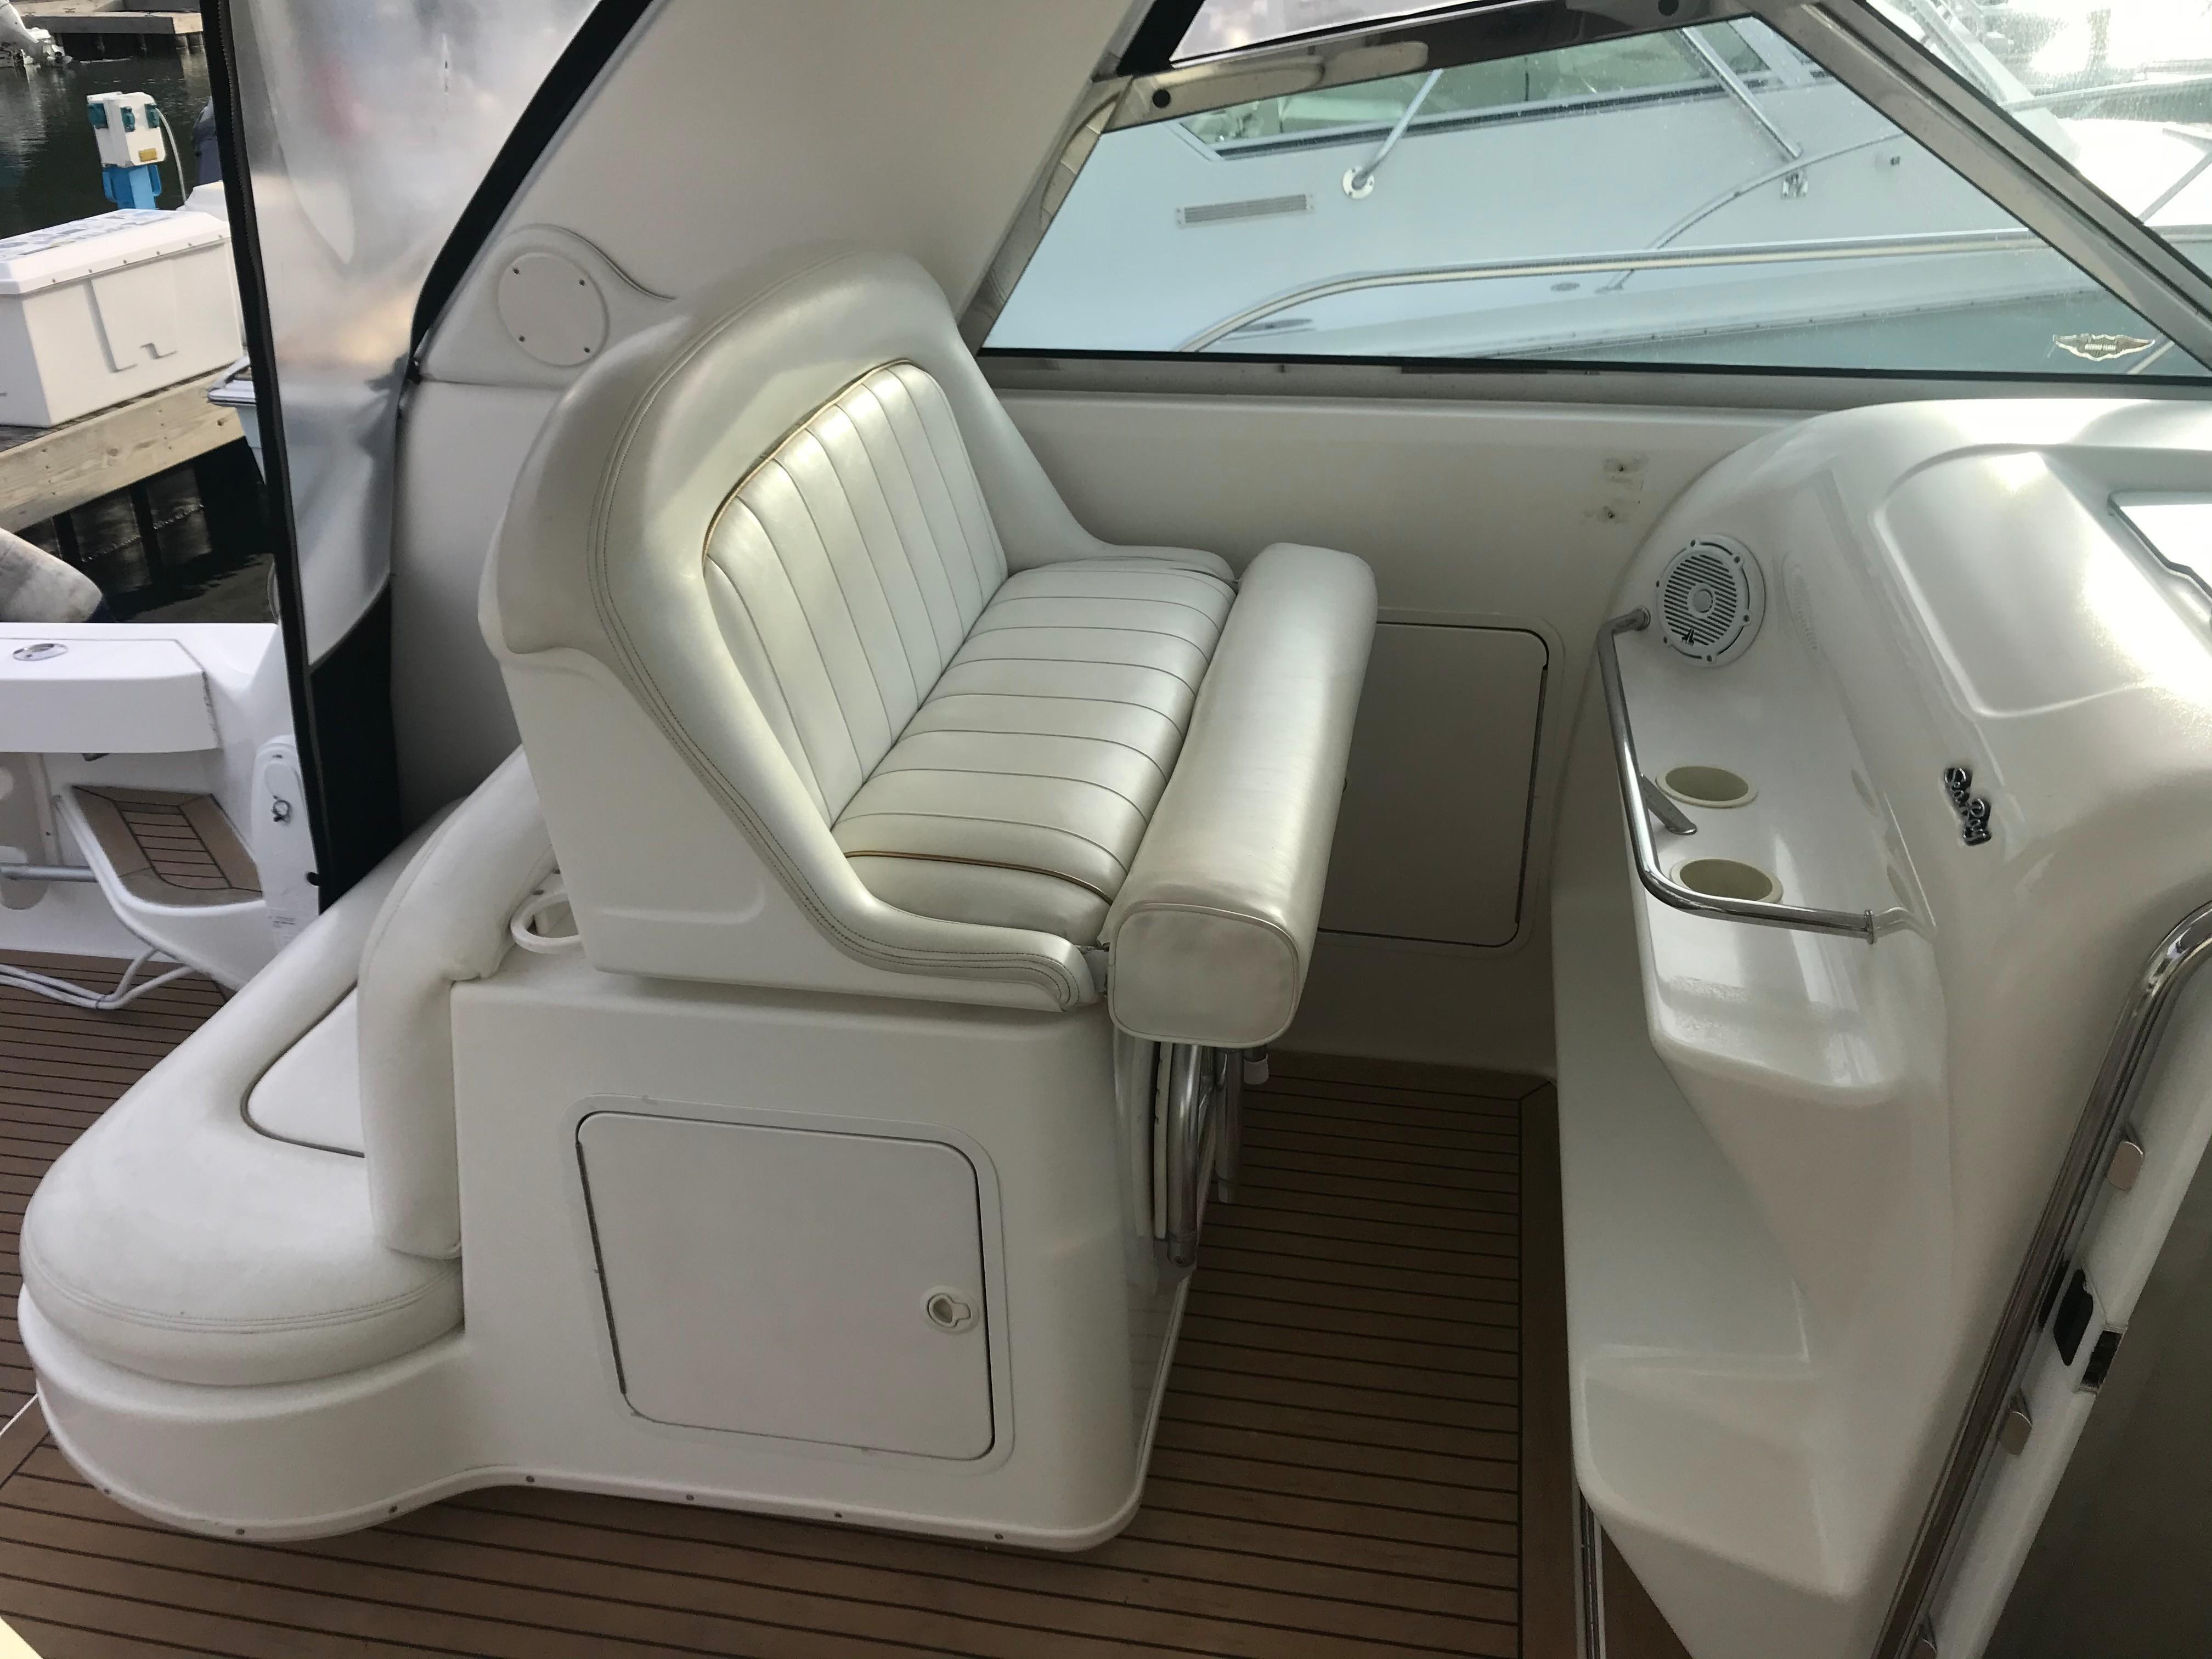 Sea Ray 370 Express Cruiser - Companion seats to port